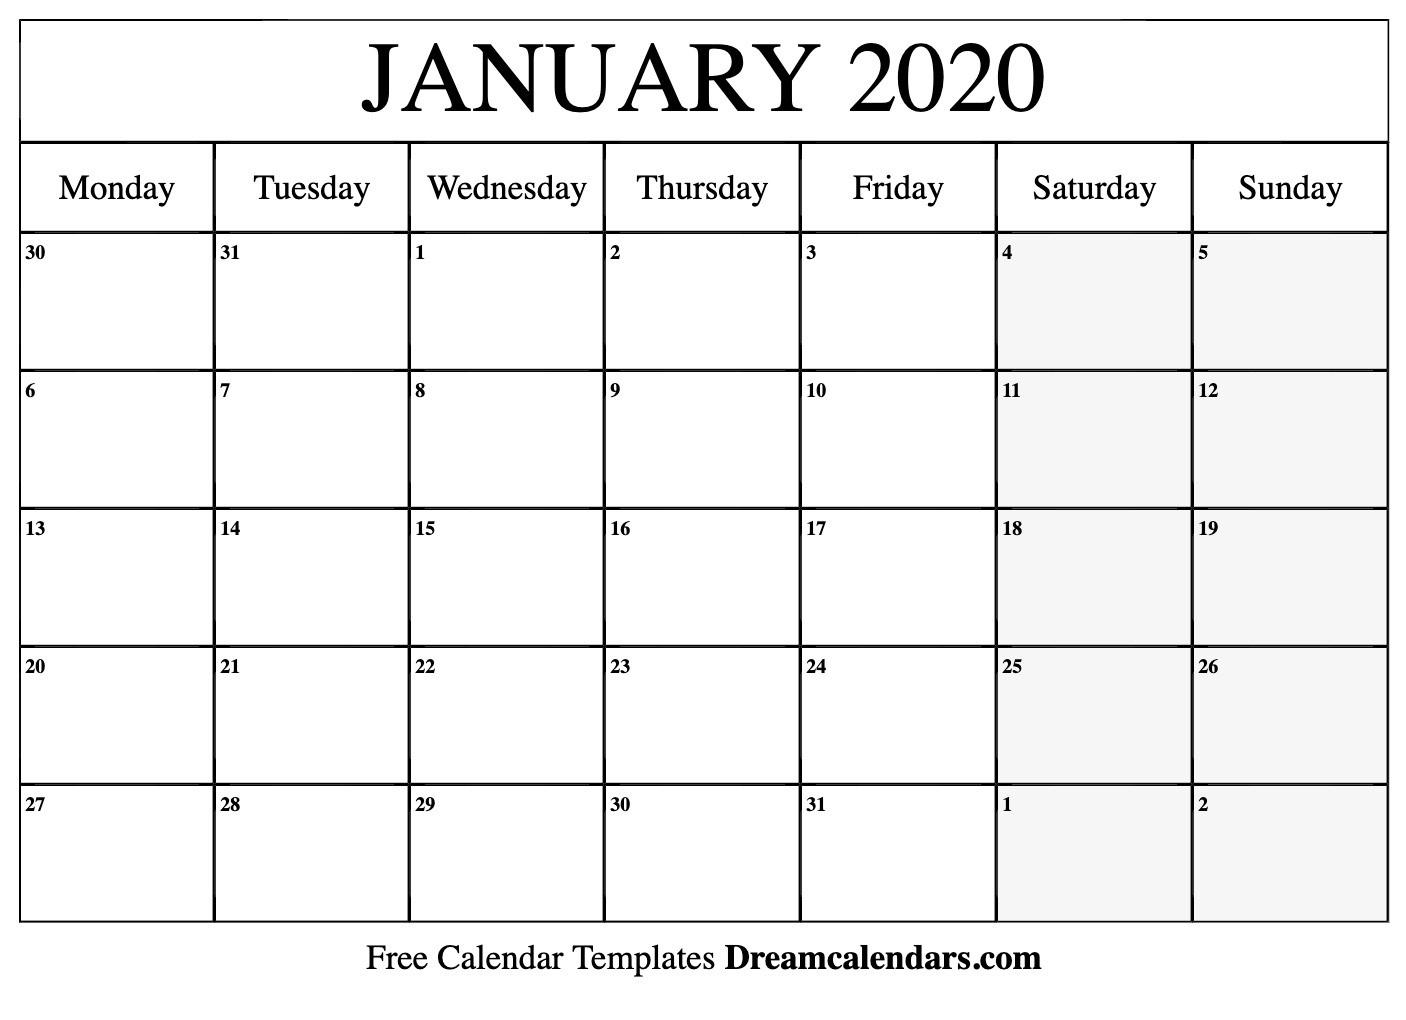 Printable January 2020 Calendar-January 2020 Calendar With Holidays Usa